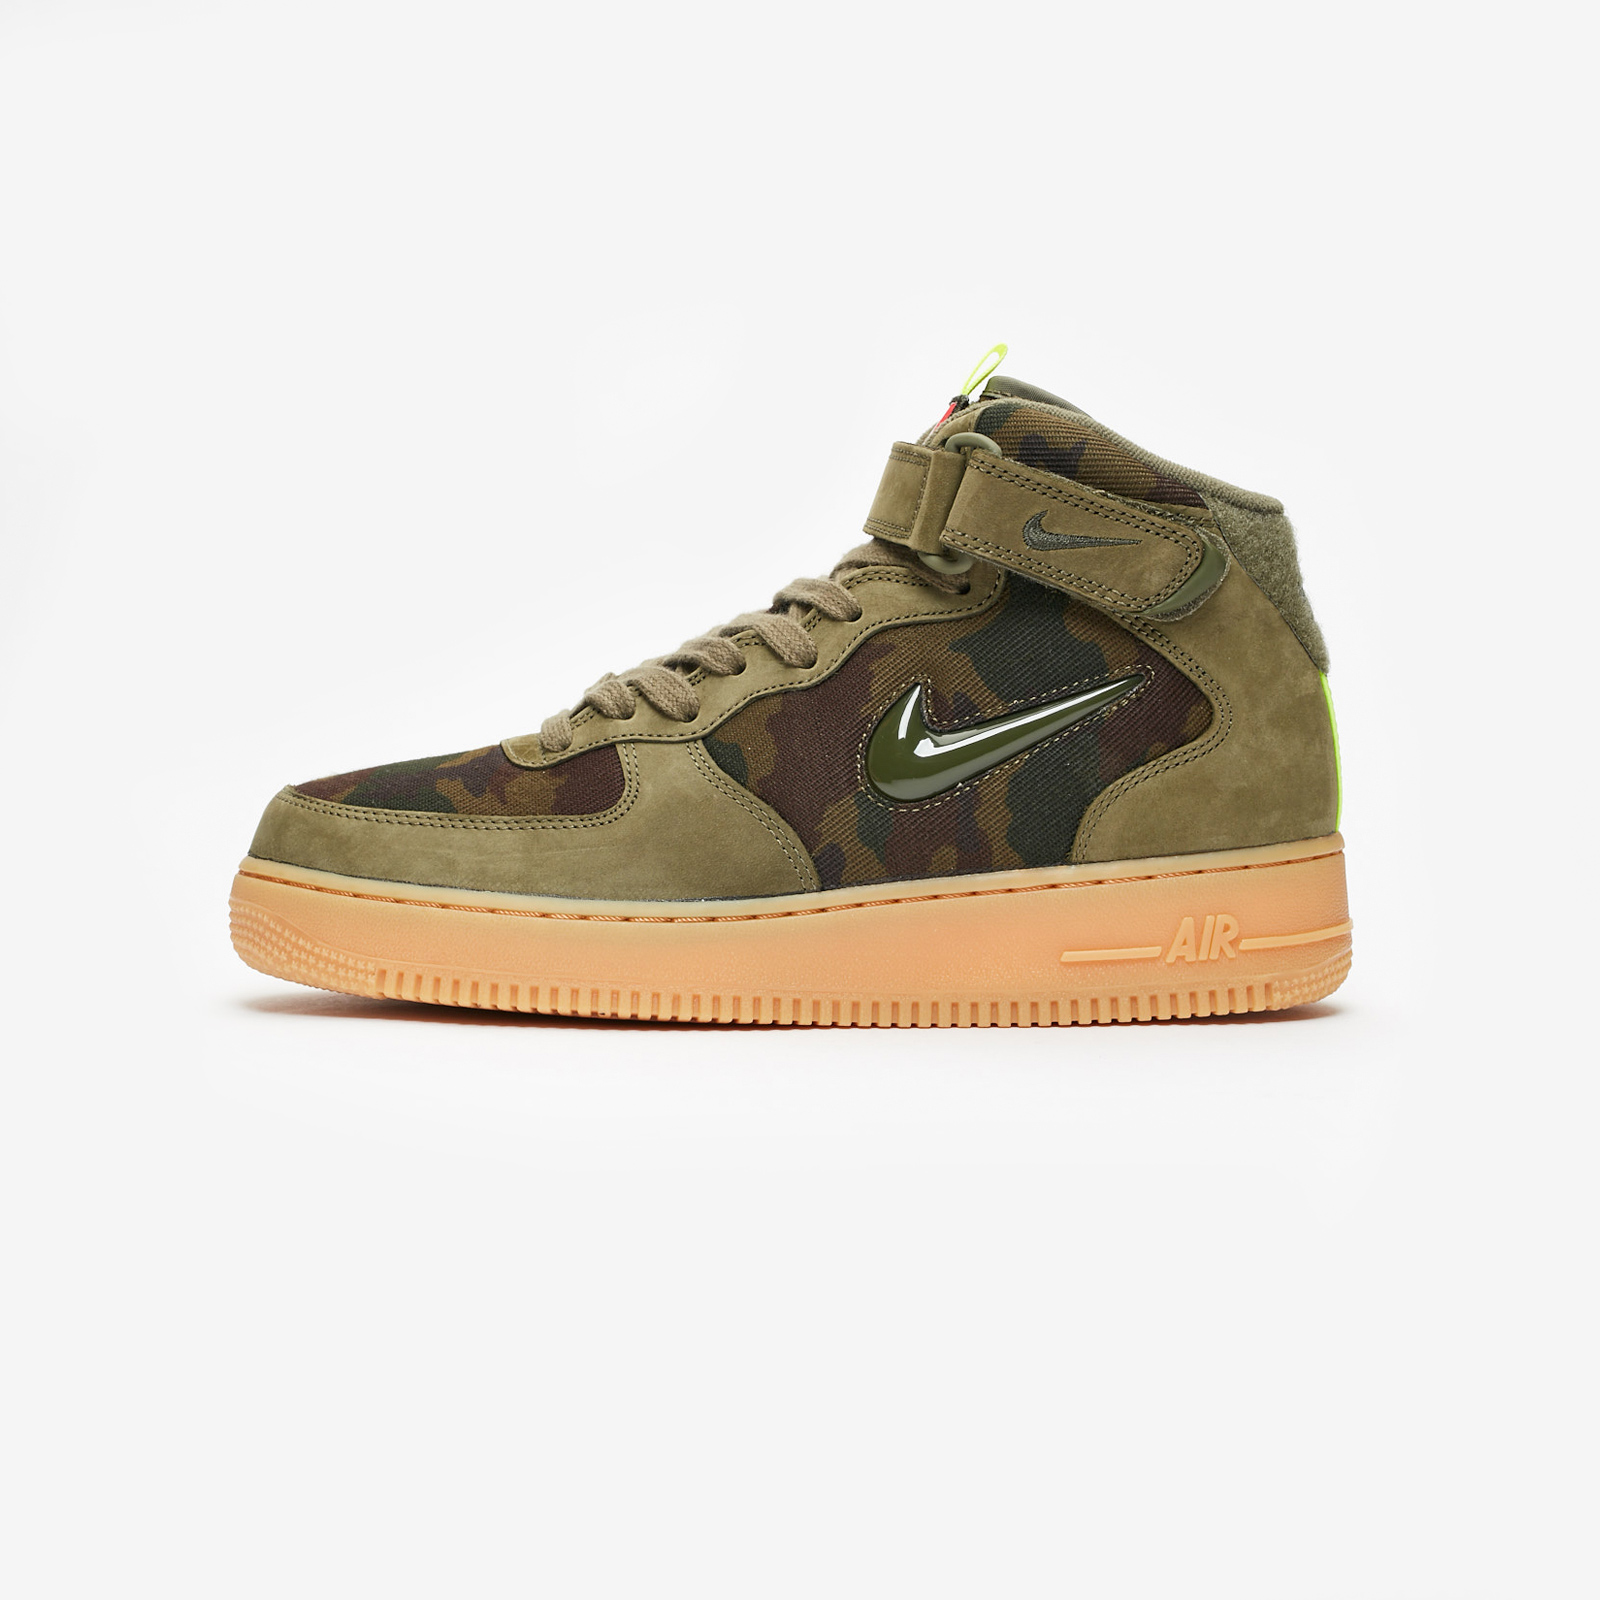 check out 7c189 f3b95 Nike Air Force 1 Jewel Mid - Av2586-200 - Sneakersnstuff   sneakers    streetwear online since 1999